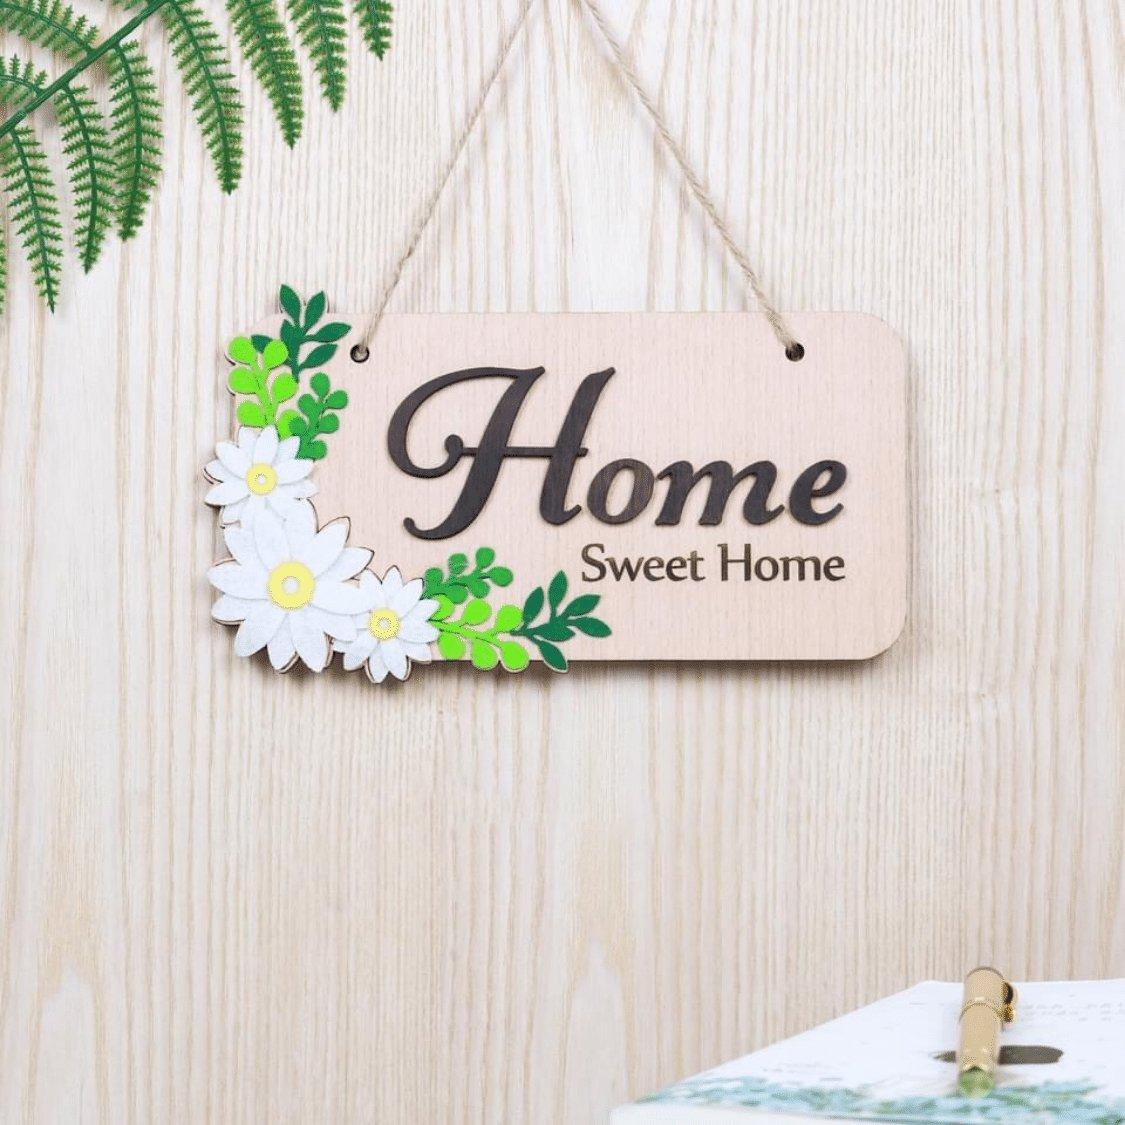 Bảng treo handmade trang trí Hoa lá Home Sweet home